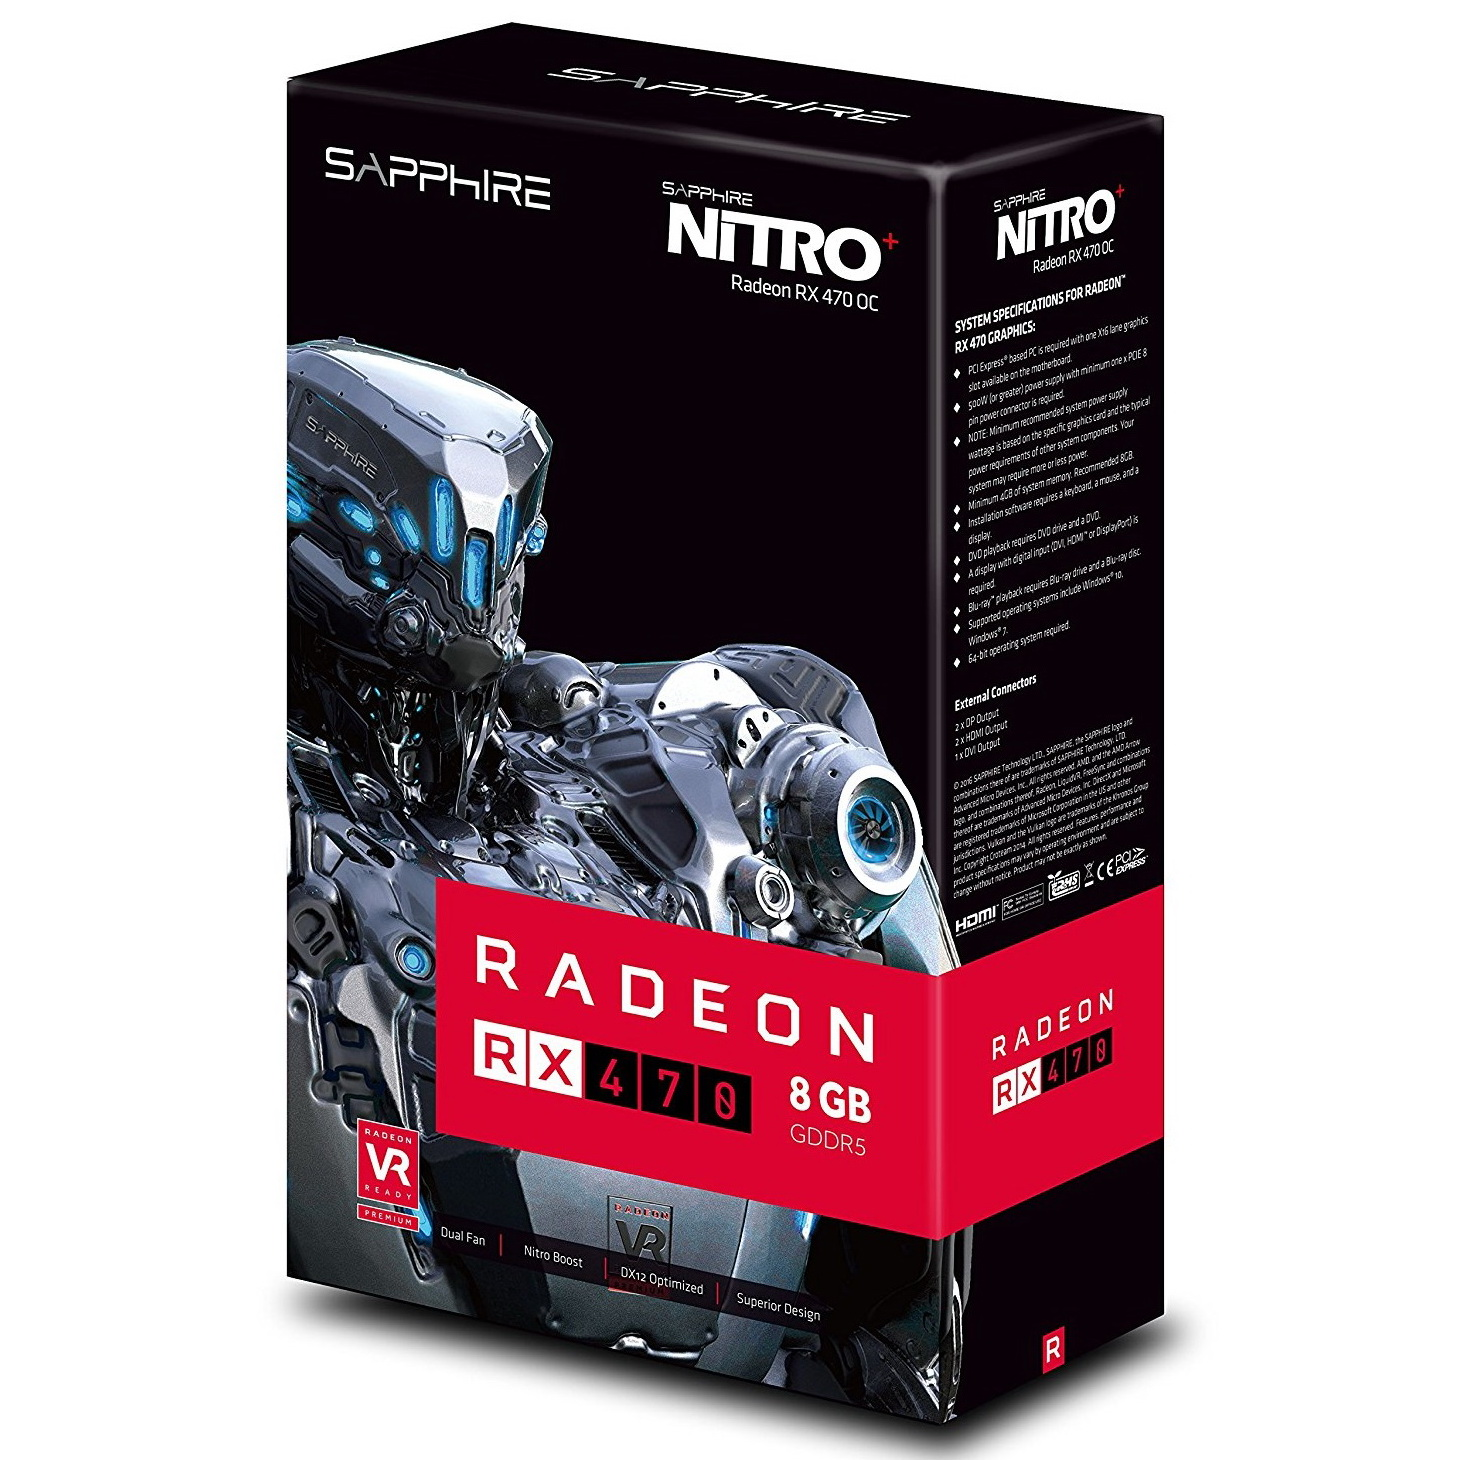 Sapphire Radeon NITRO Rx 470 8GB GDDR5